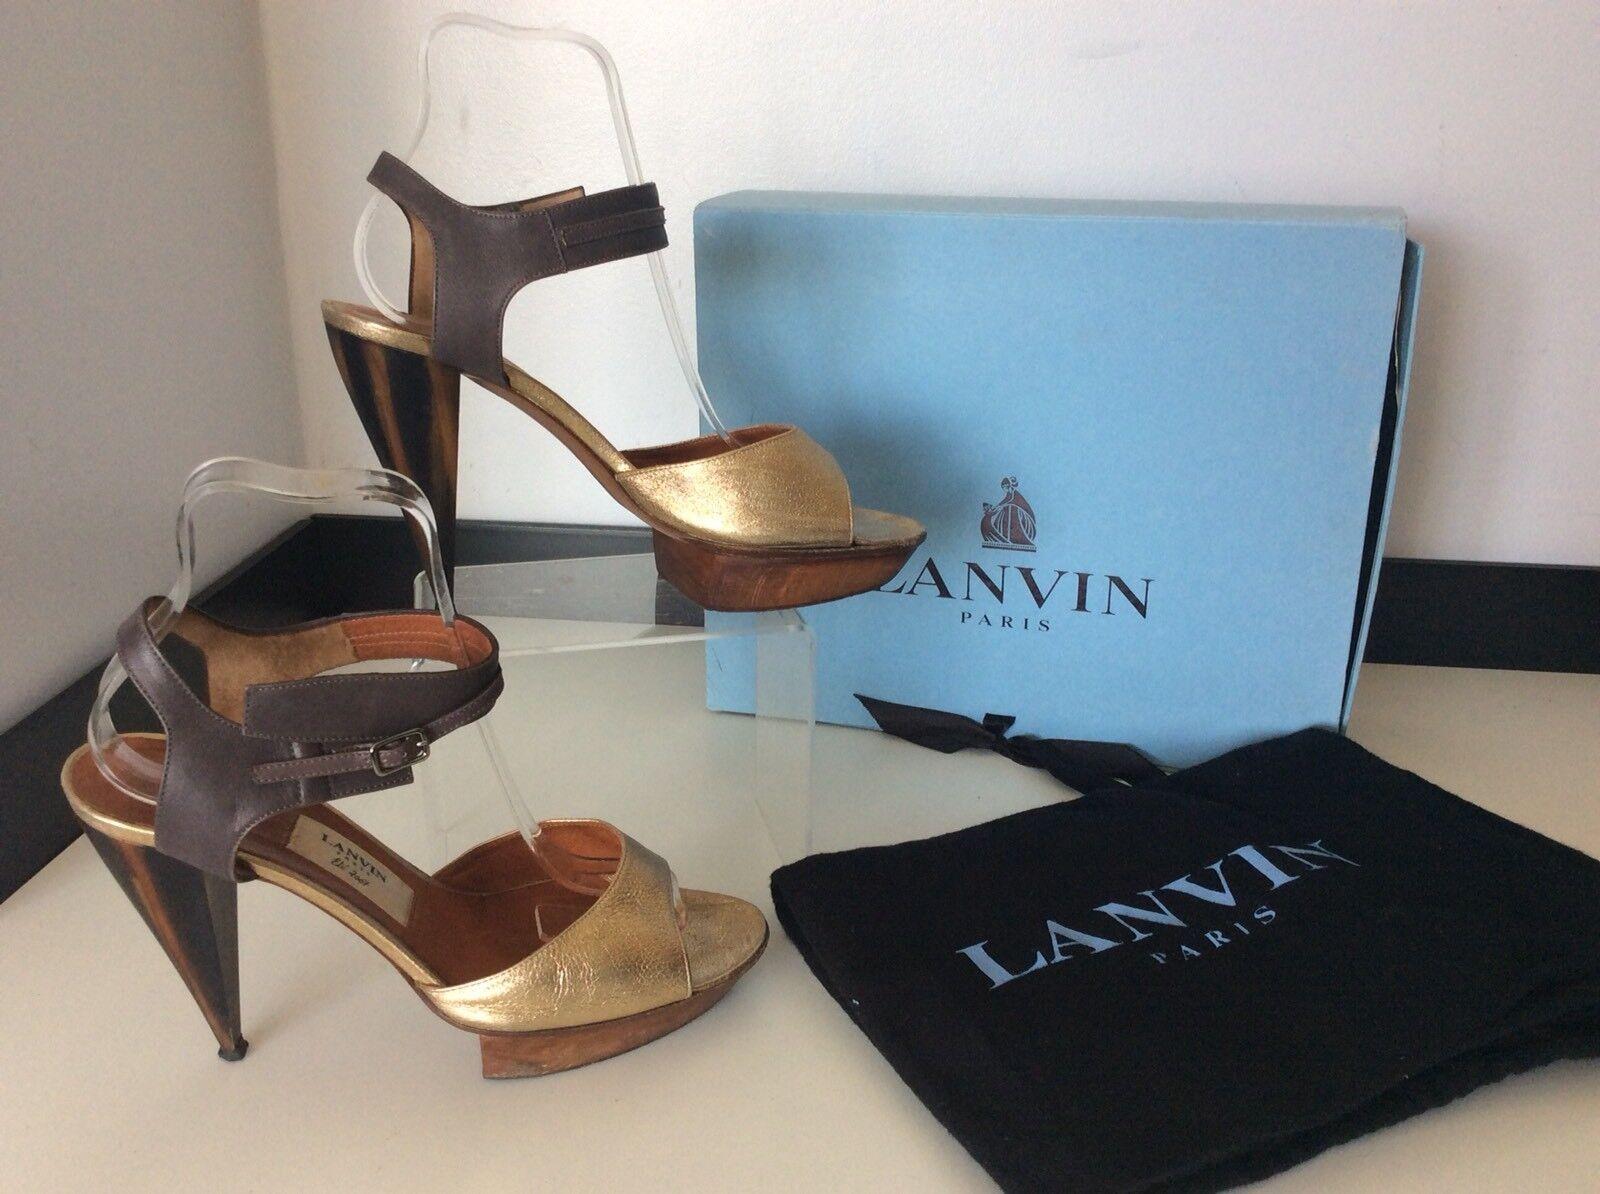 Lanvin Gold Sandales Sandales Sandales Schuhes Peep Toe Größe 39 Uk 6 Boxed Rrp  Gc Heels 4b61a8